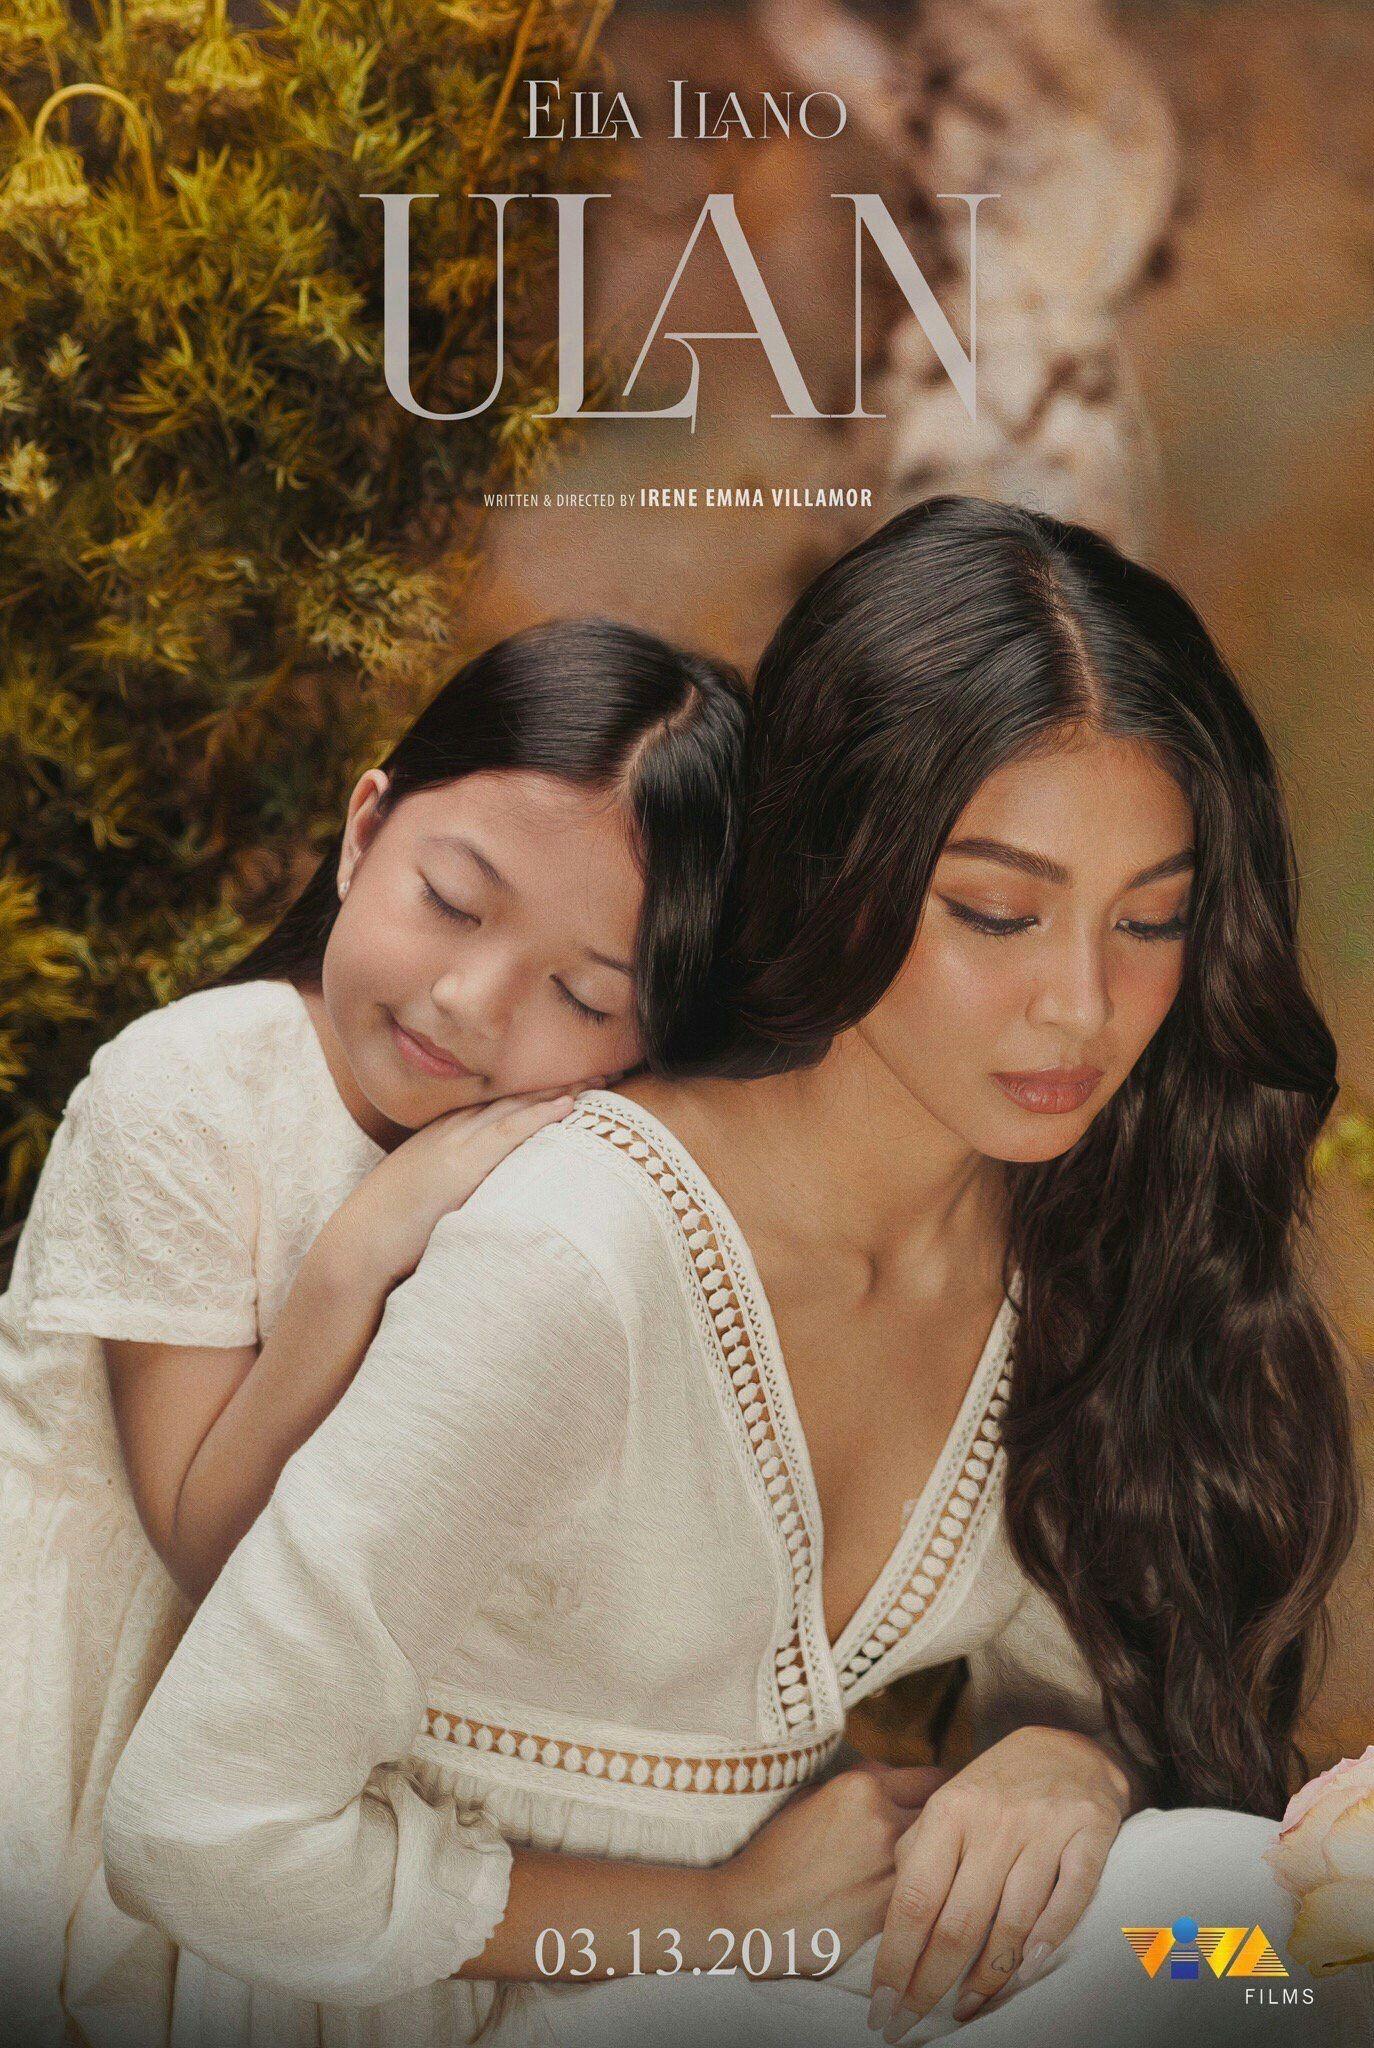 Viva Films Ig Post Feb 10 2019 Maya Maya